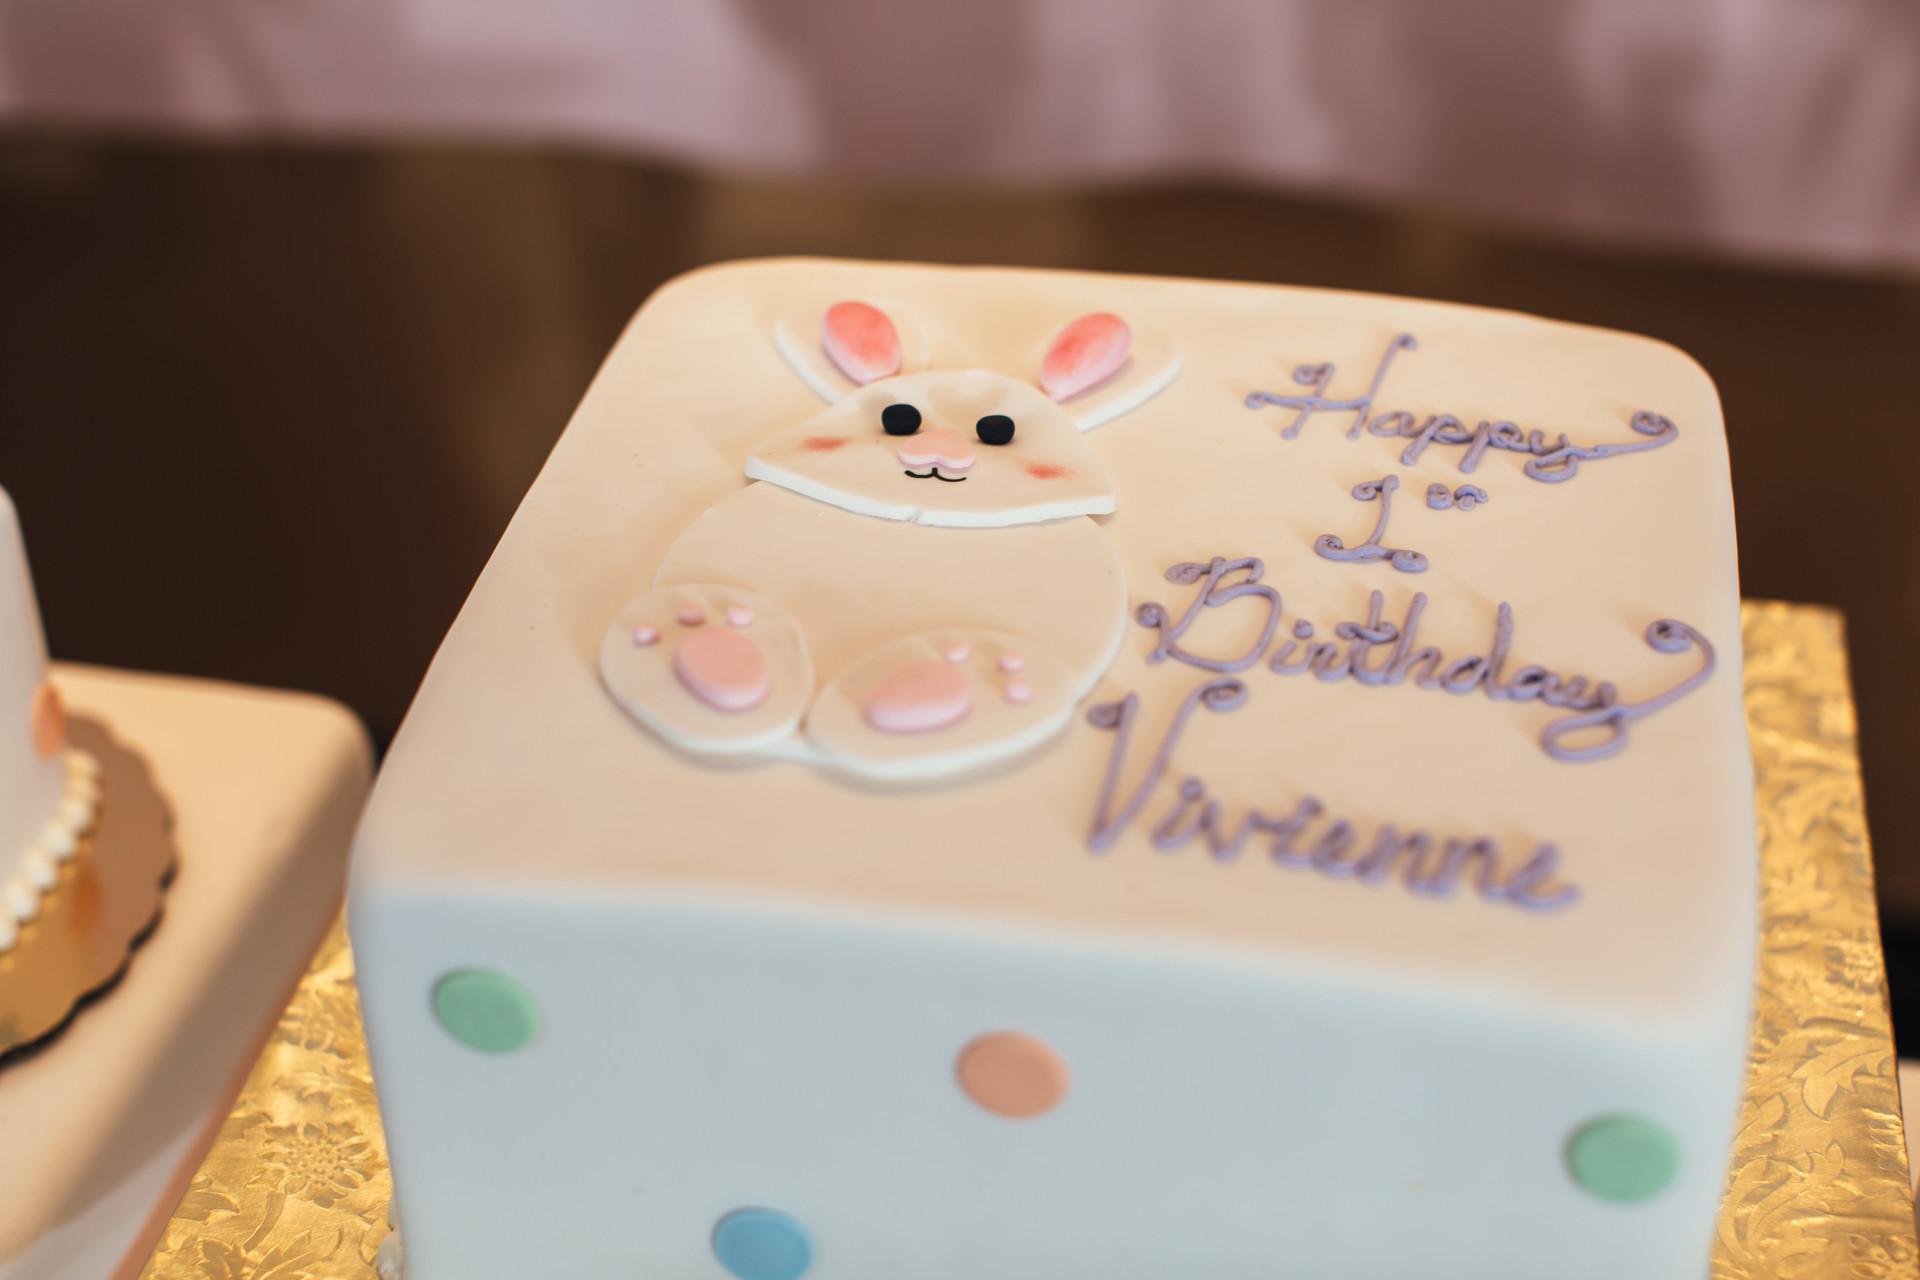 20150404_Vivienne_Birthday_260.jpg